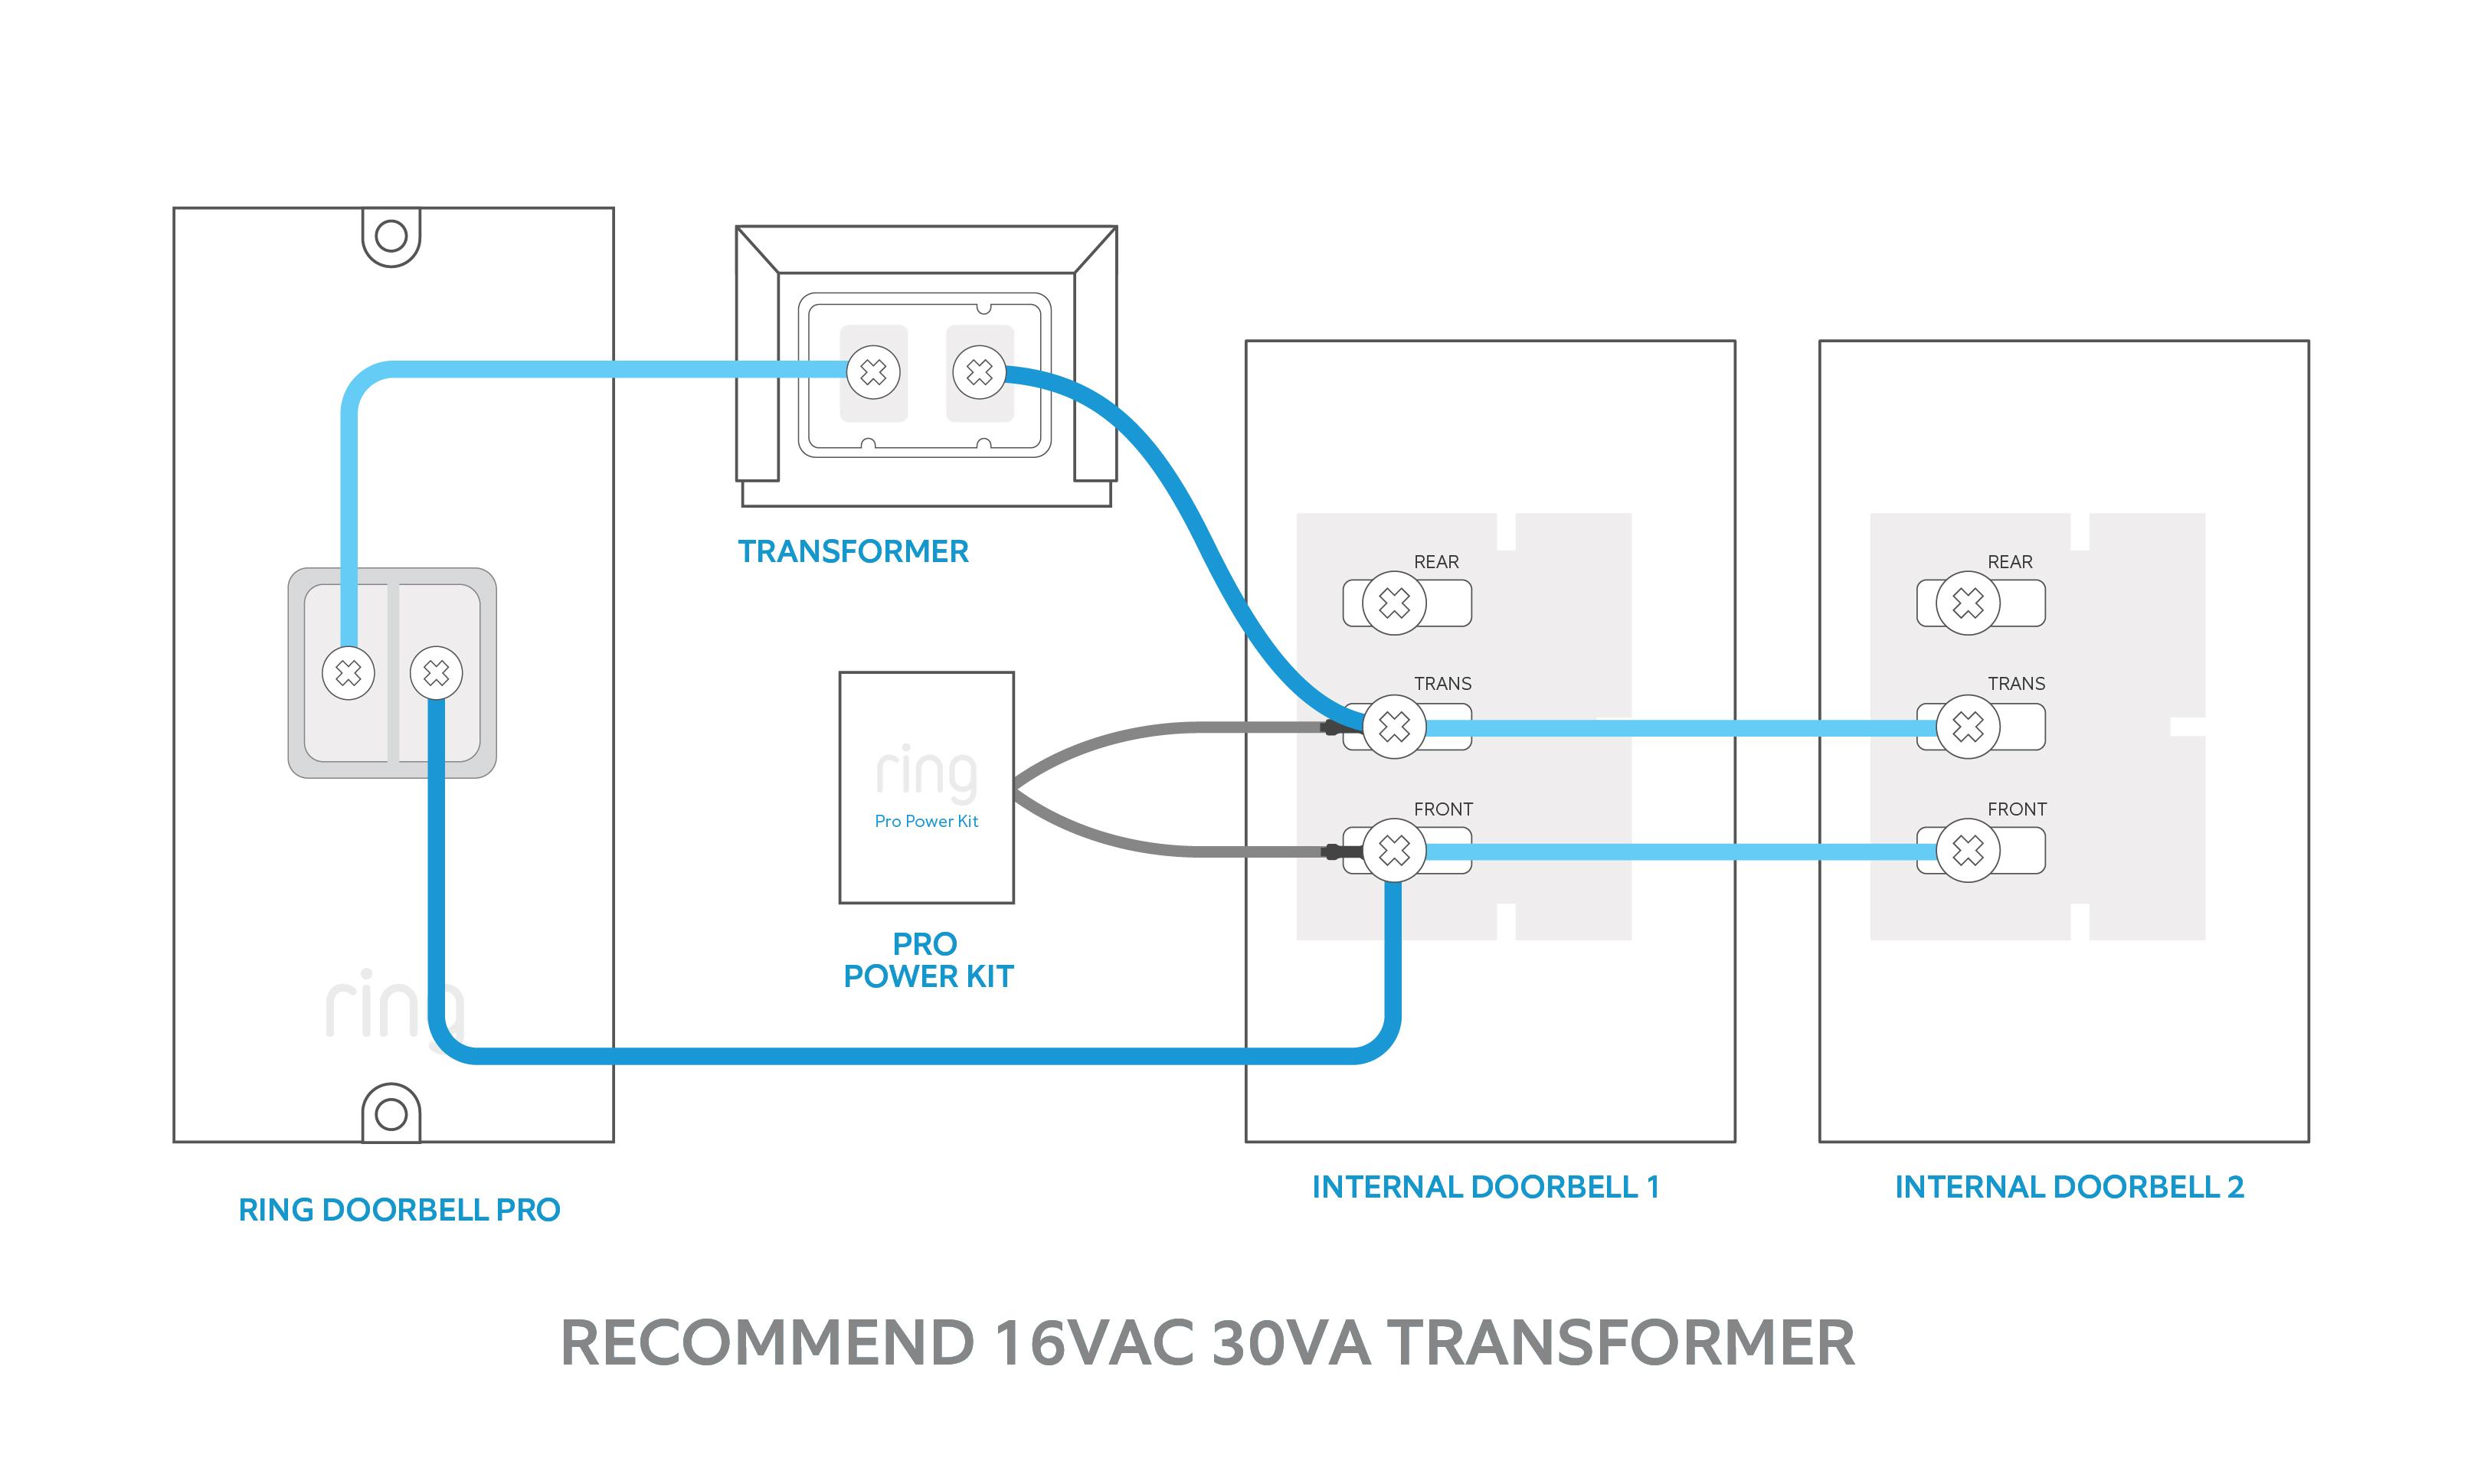 [DIAGRAM_5UK]  Circuit Diagram Of Doorbell - Auto Electrical Wiring Diagram | Mcii Delfield Freezer Wire Diagram |  | schema-cablagex.webredirect.org